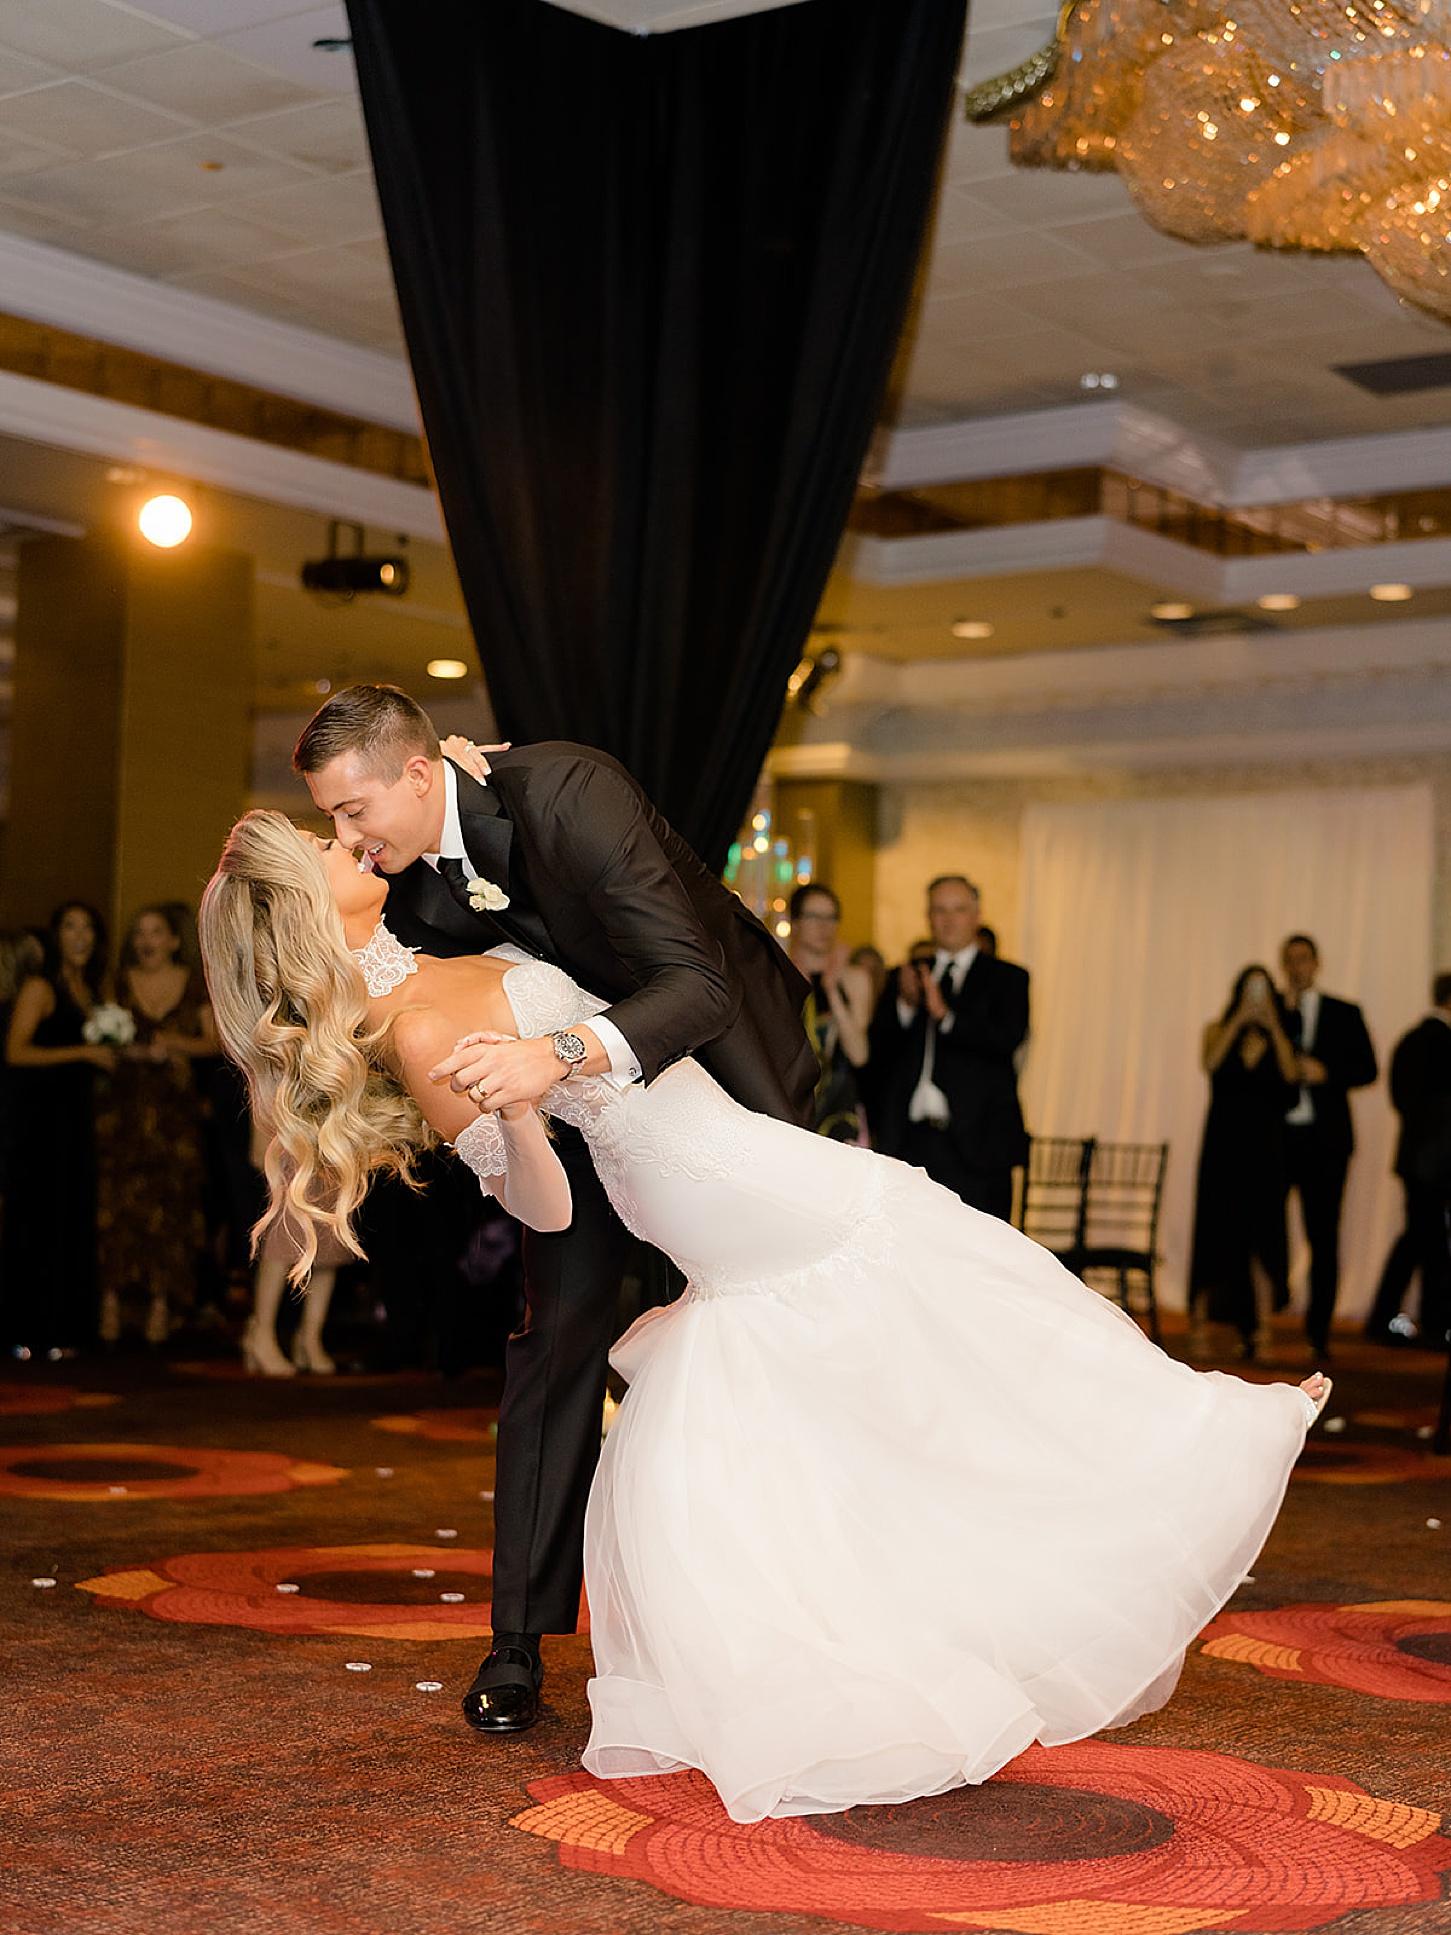 Atlantic City Wedding Photography Studio by Magdalena Studios Lexy Cha 0088